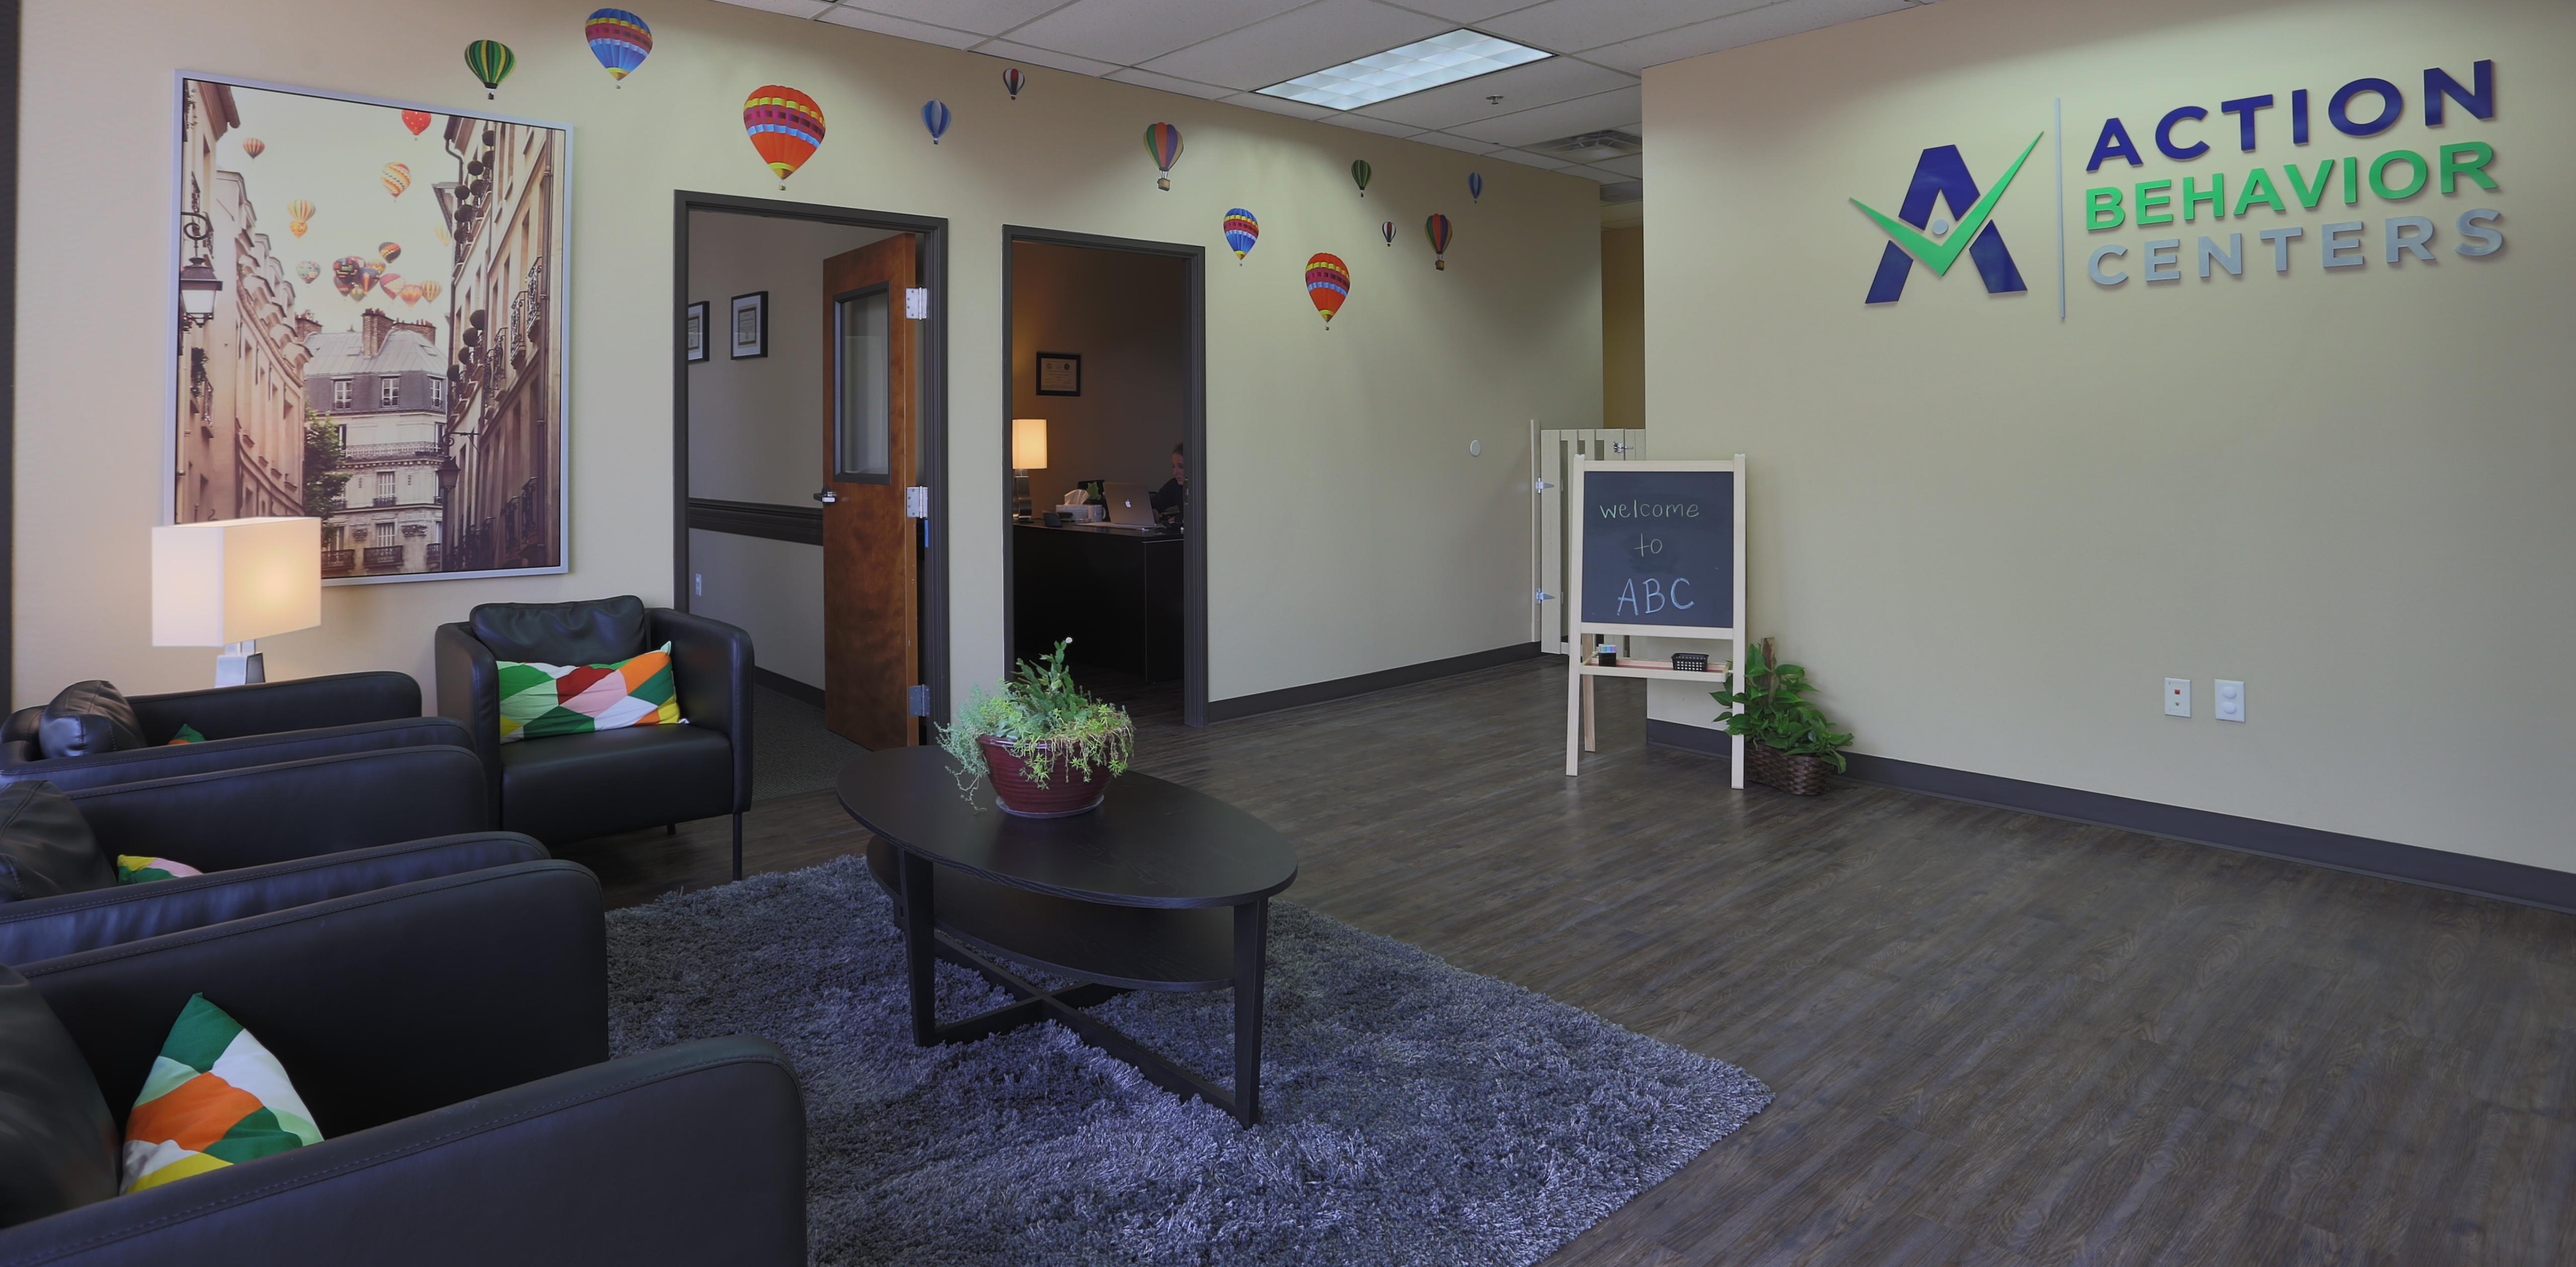 Action Behavior Centers In Austin Tx 512 572 0